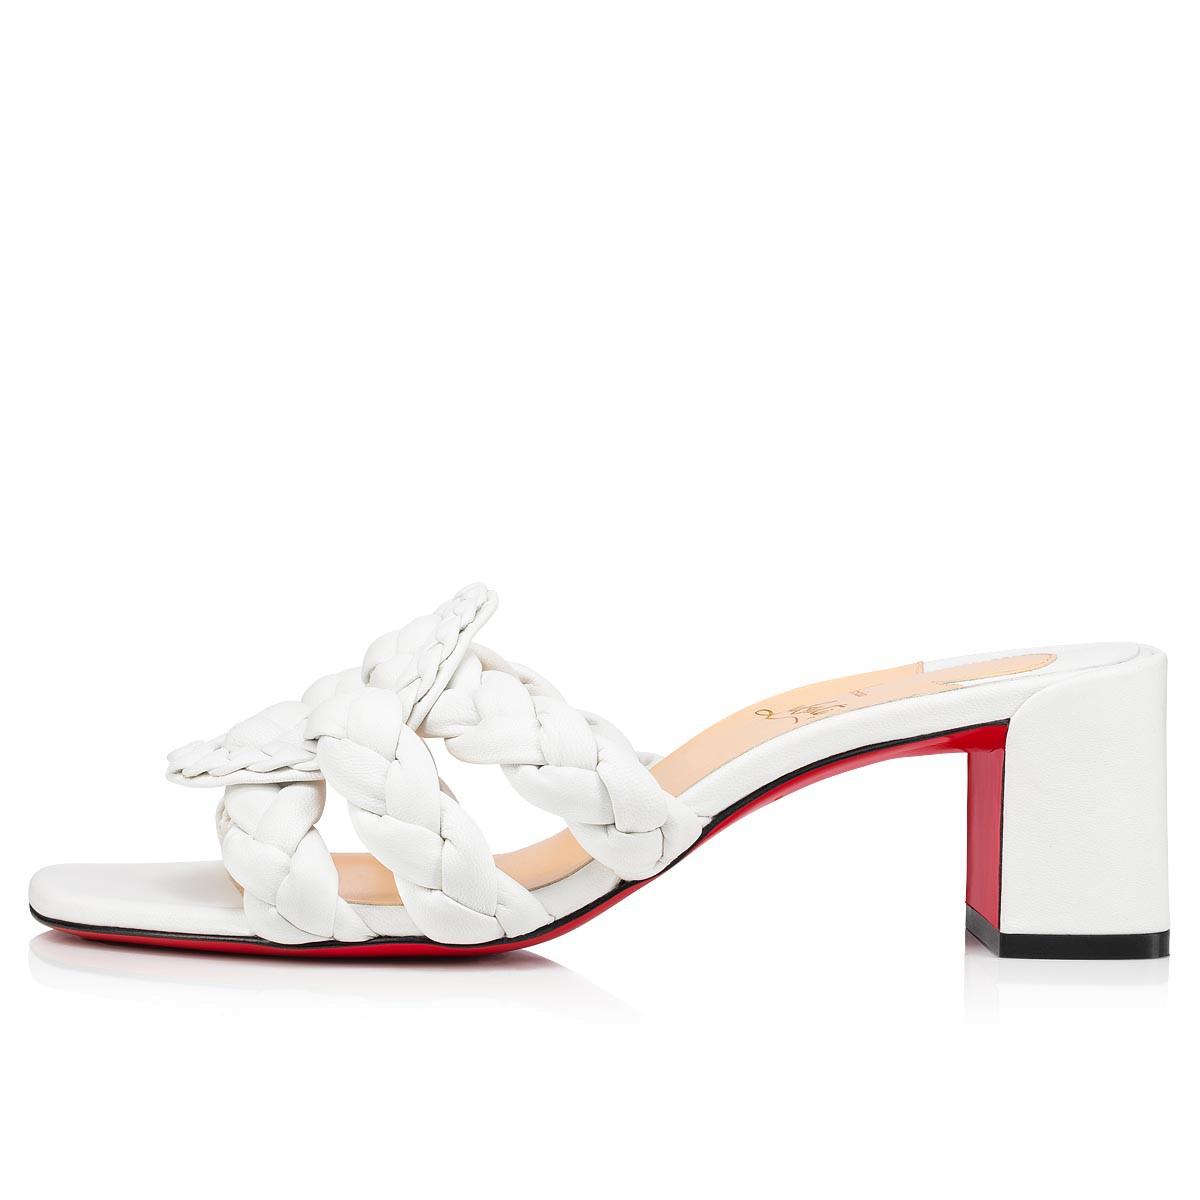 Shoes - Marmela - Christian Louboutin